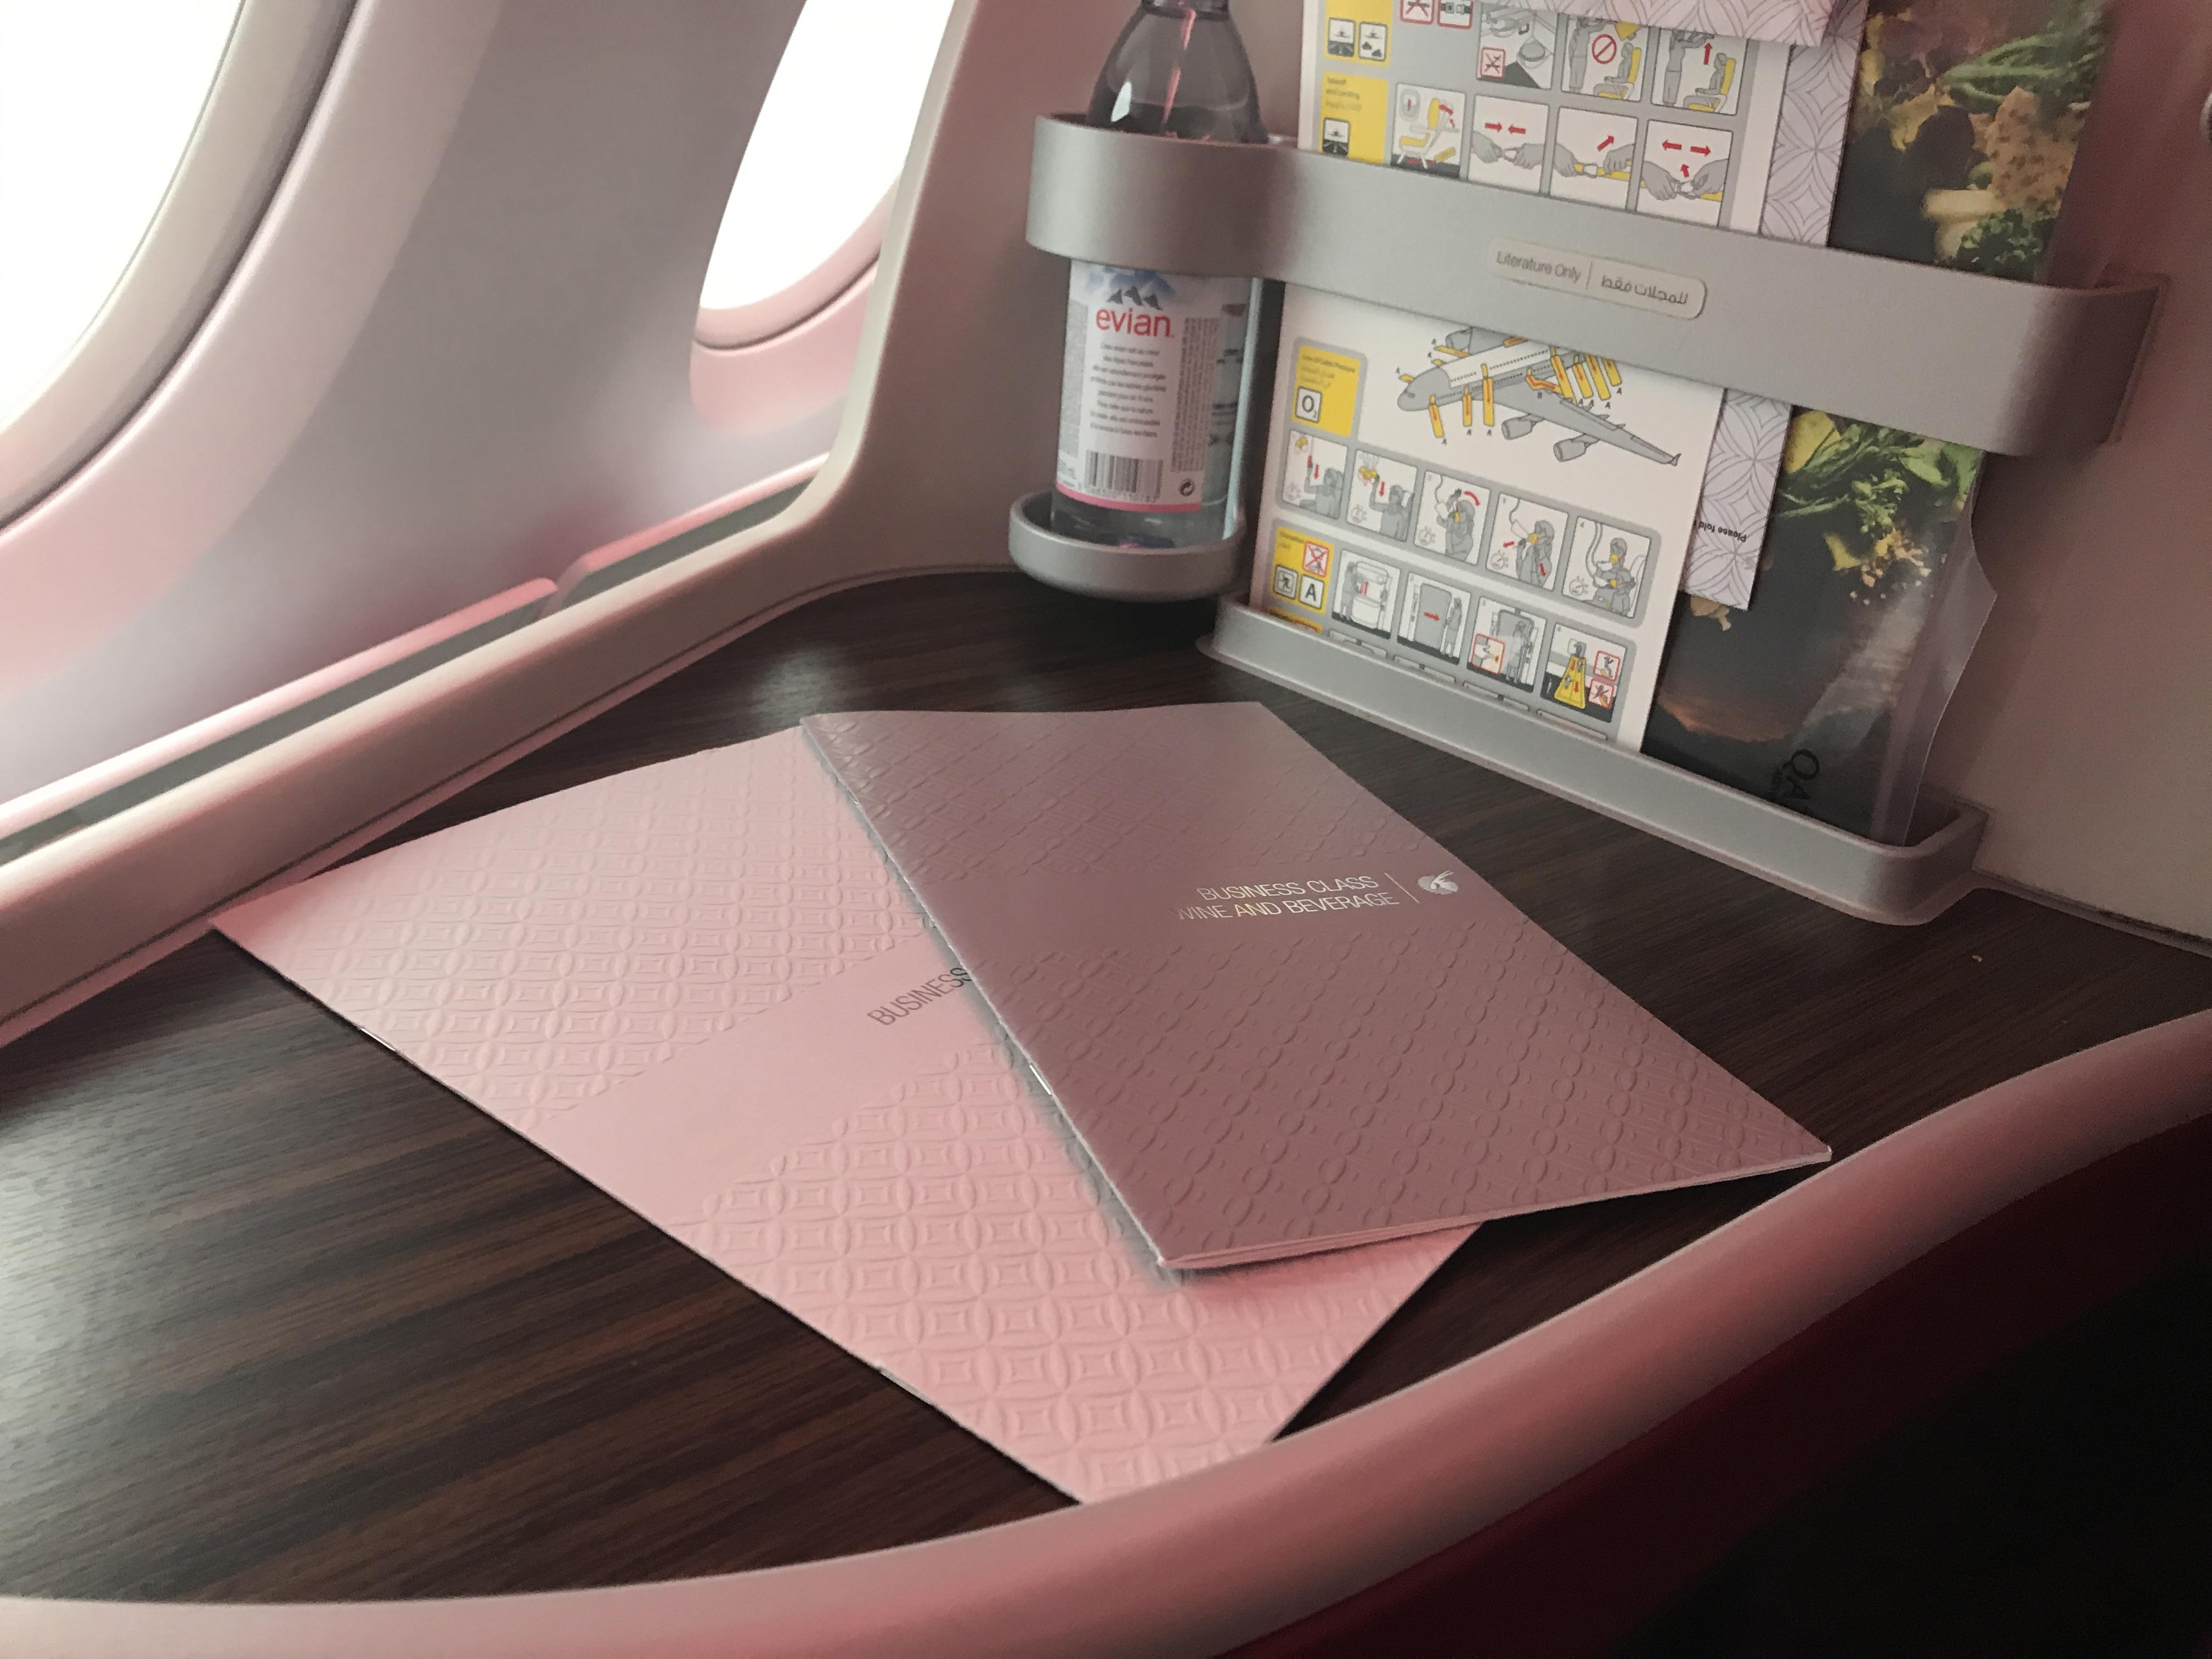 Qatar Airways A380 business class review